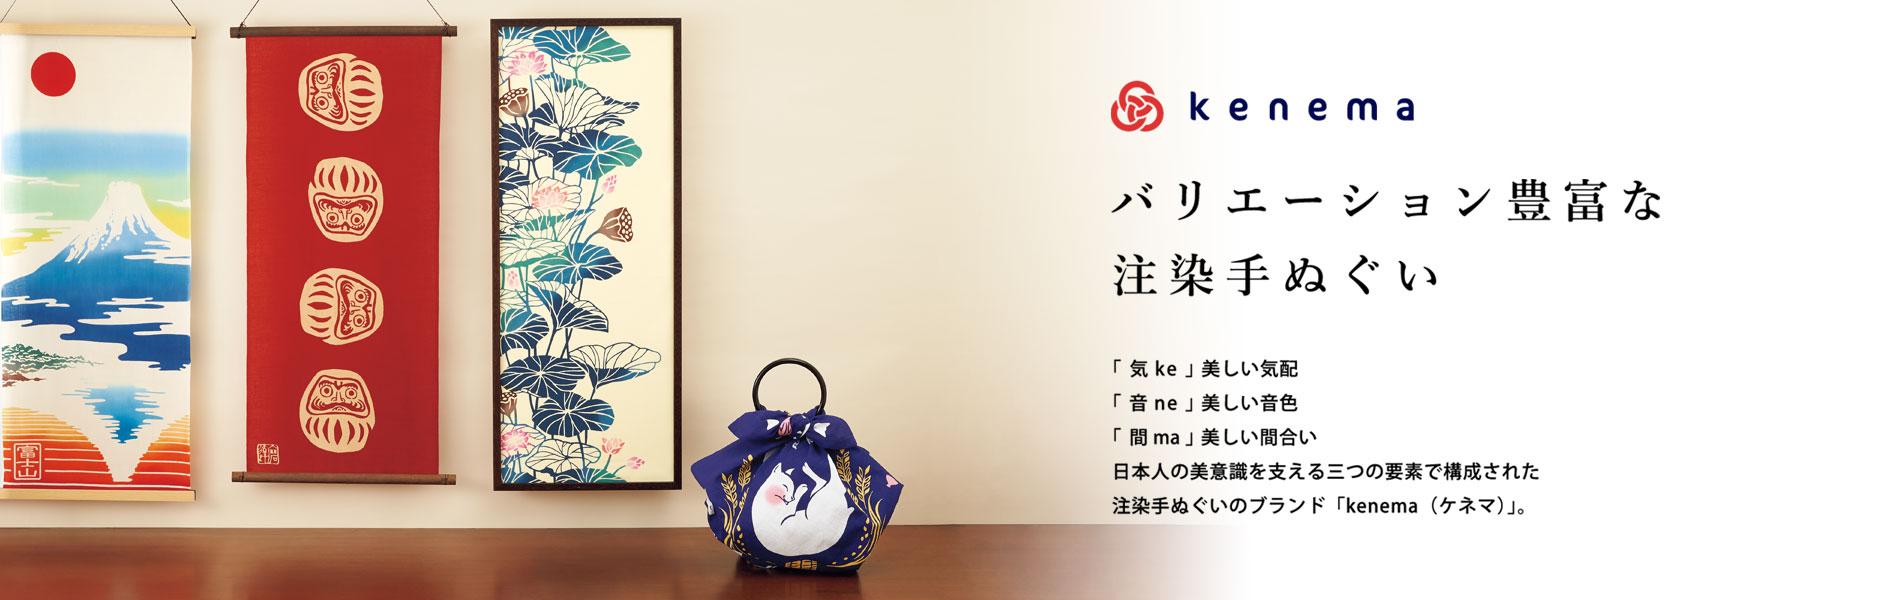 kenema 気音間 トップイメージ